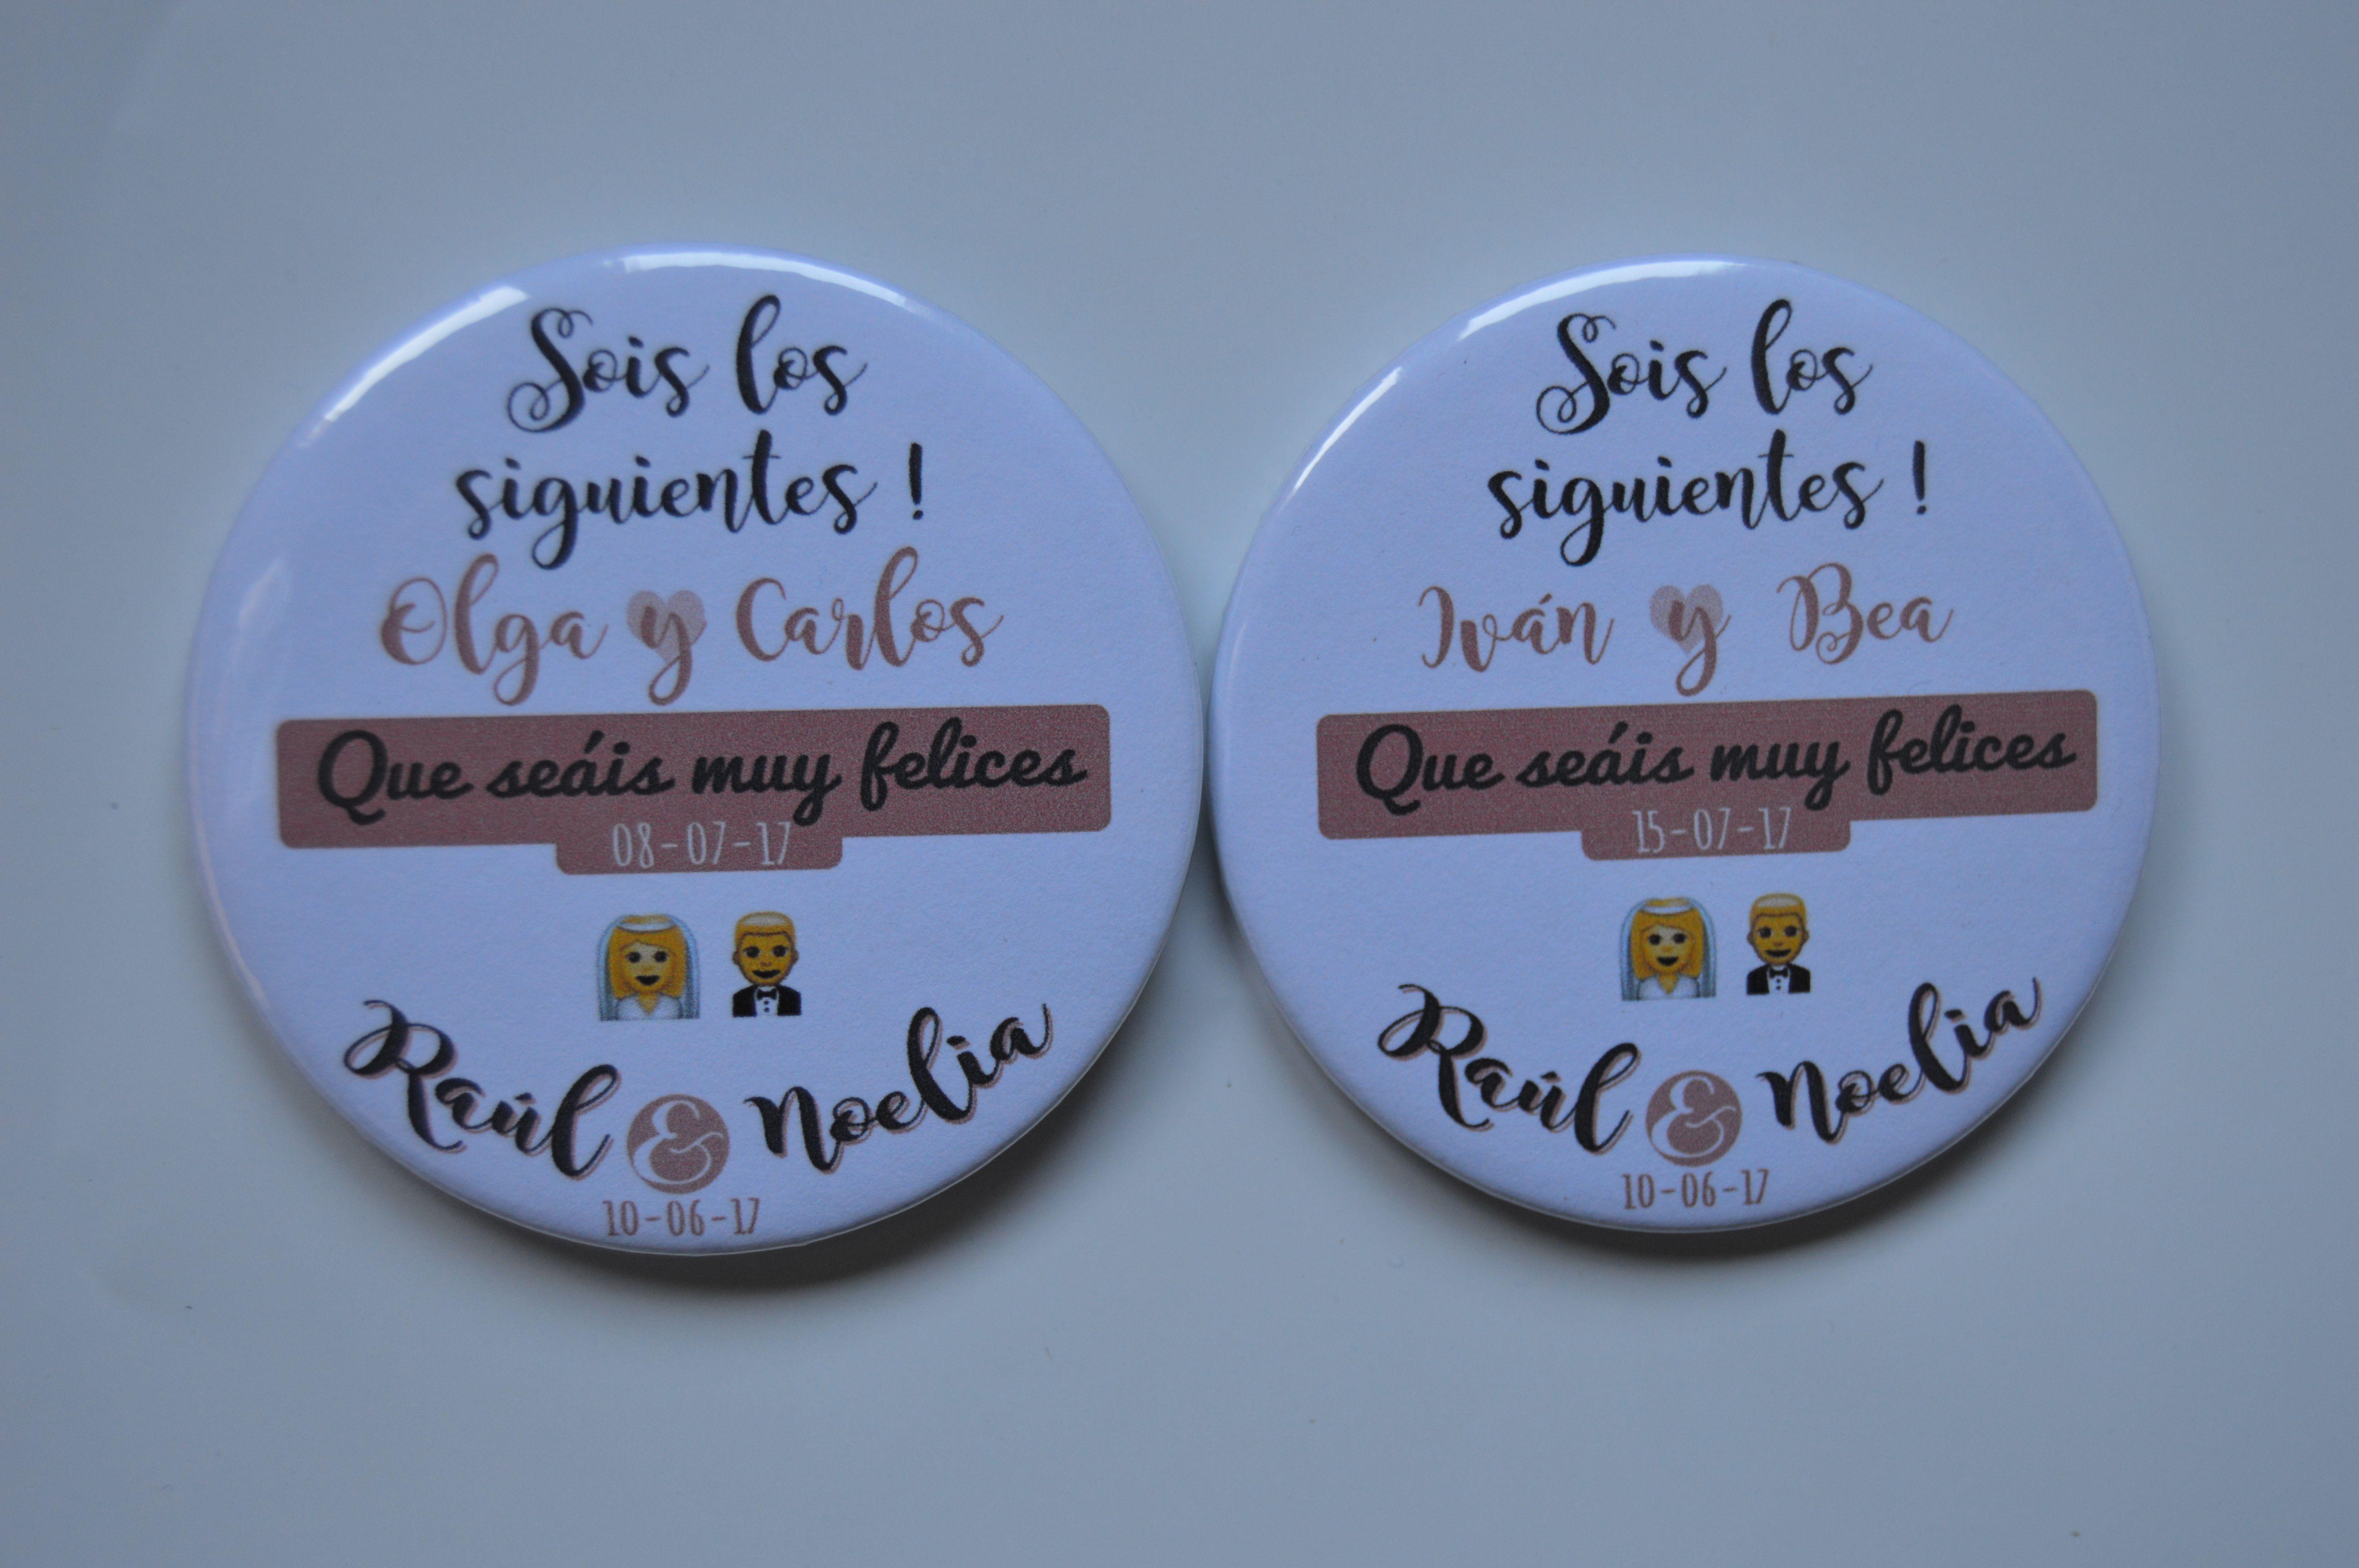 Chapa Boda Sois Los Siguientes Chapas Bodas Wedding Pins En